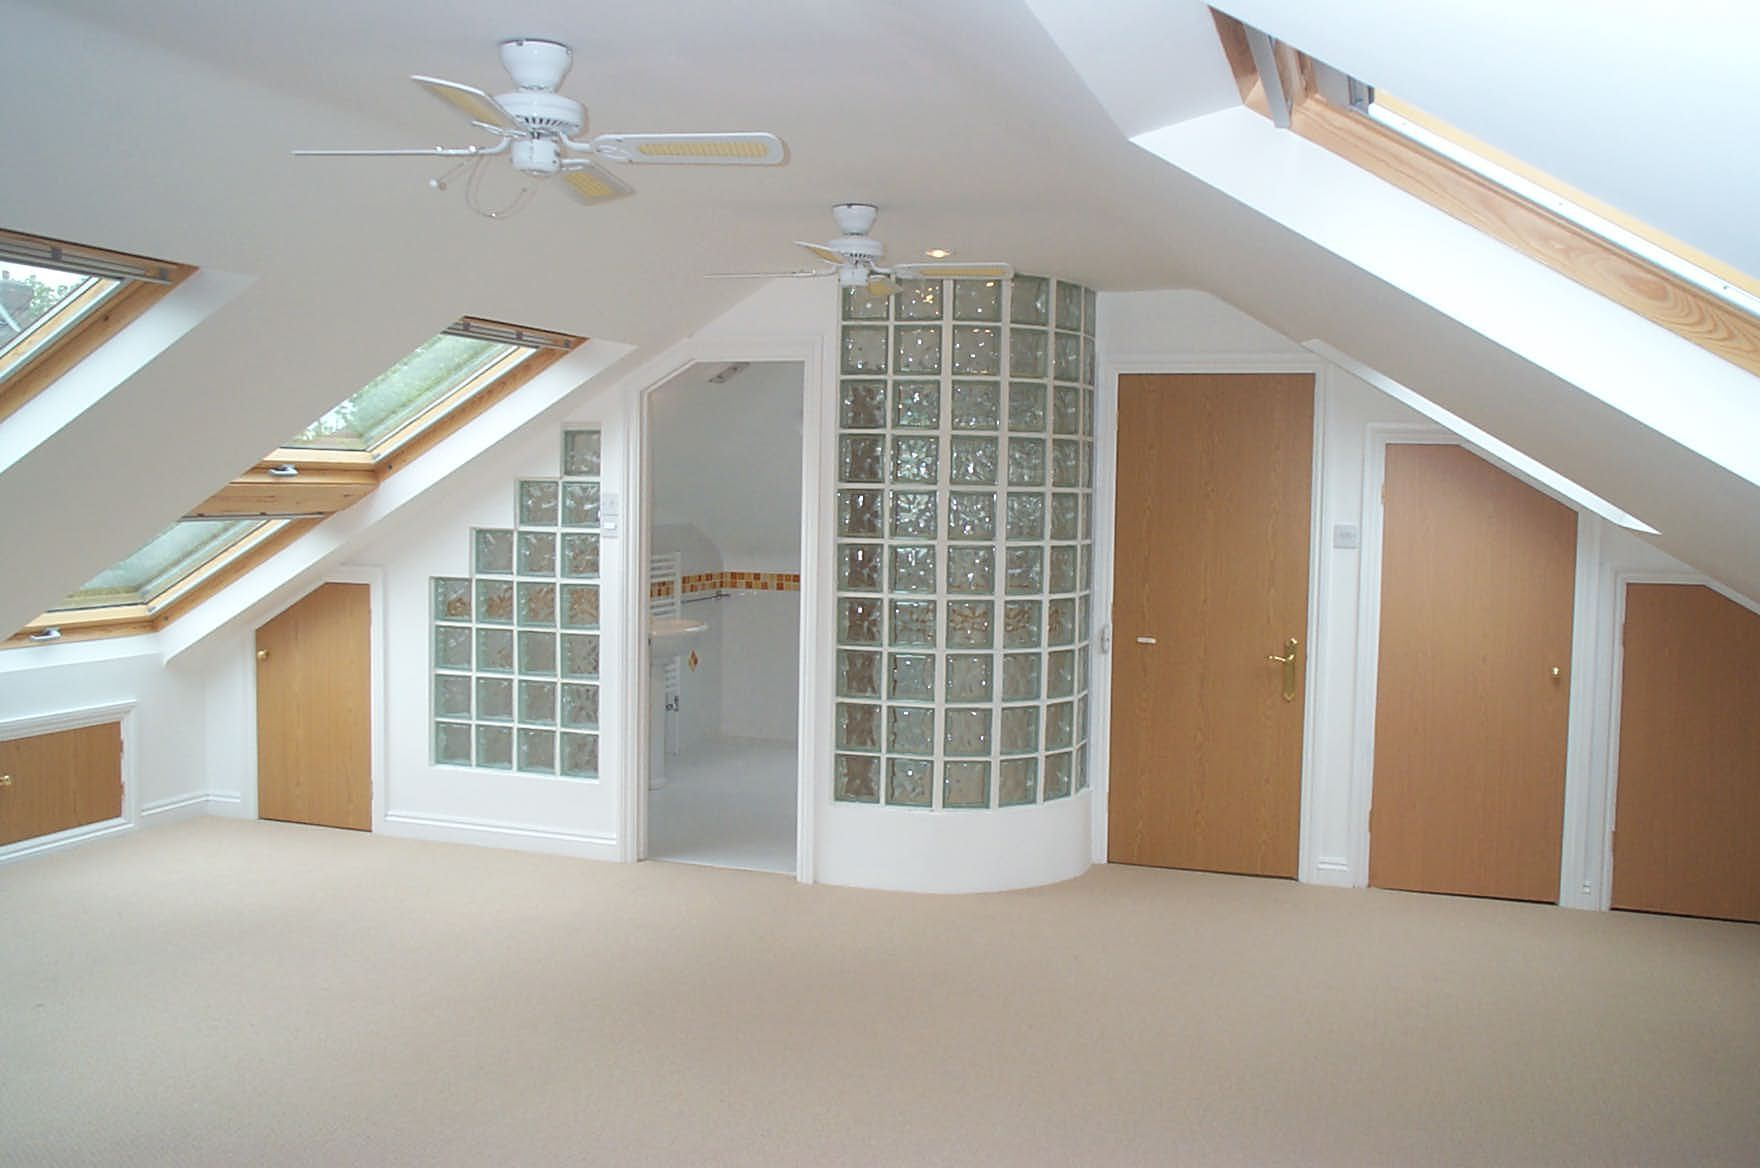 Loft bedroom with ensuite  Attic conversion for bedroom with en suite  house ideas